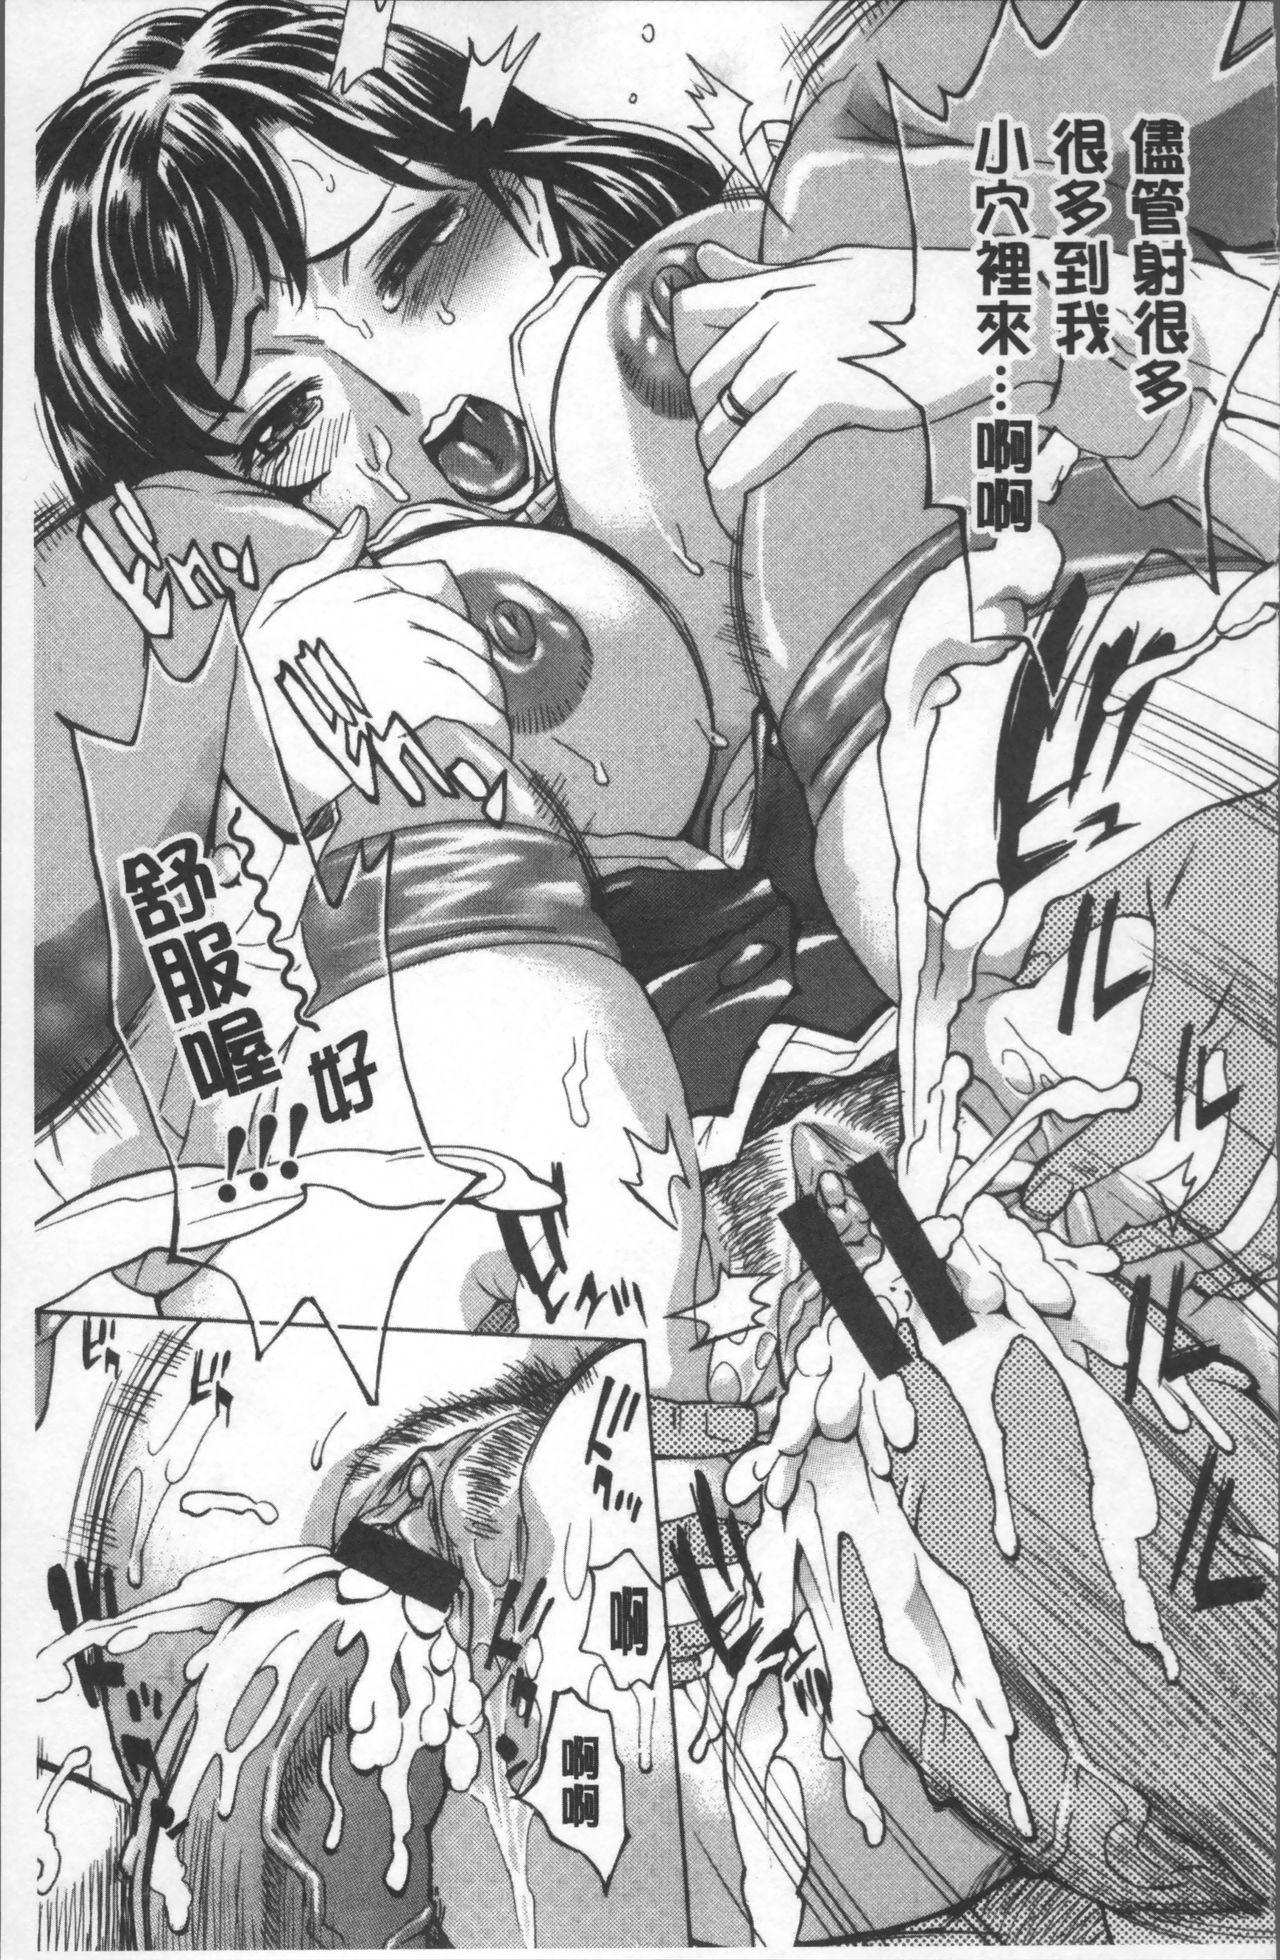 Hitozuma Kanshasai - SUPER EROTIC WIFE'S FESTIVAL 176